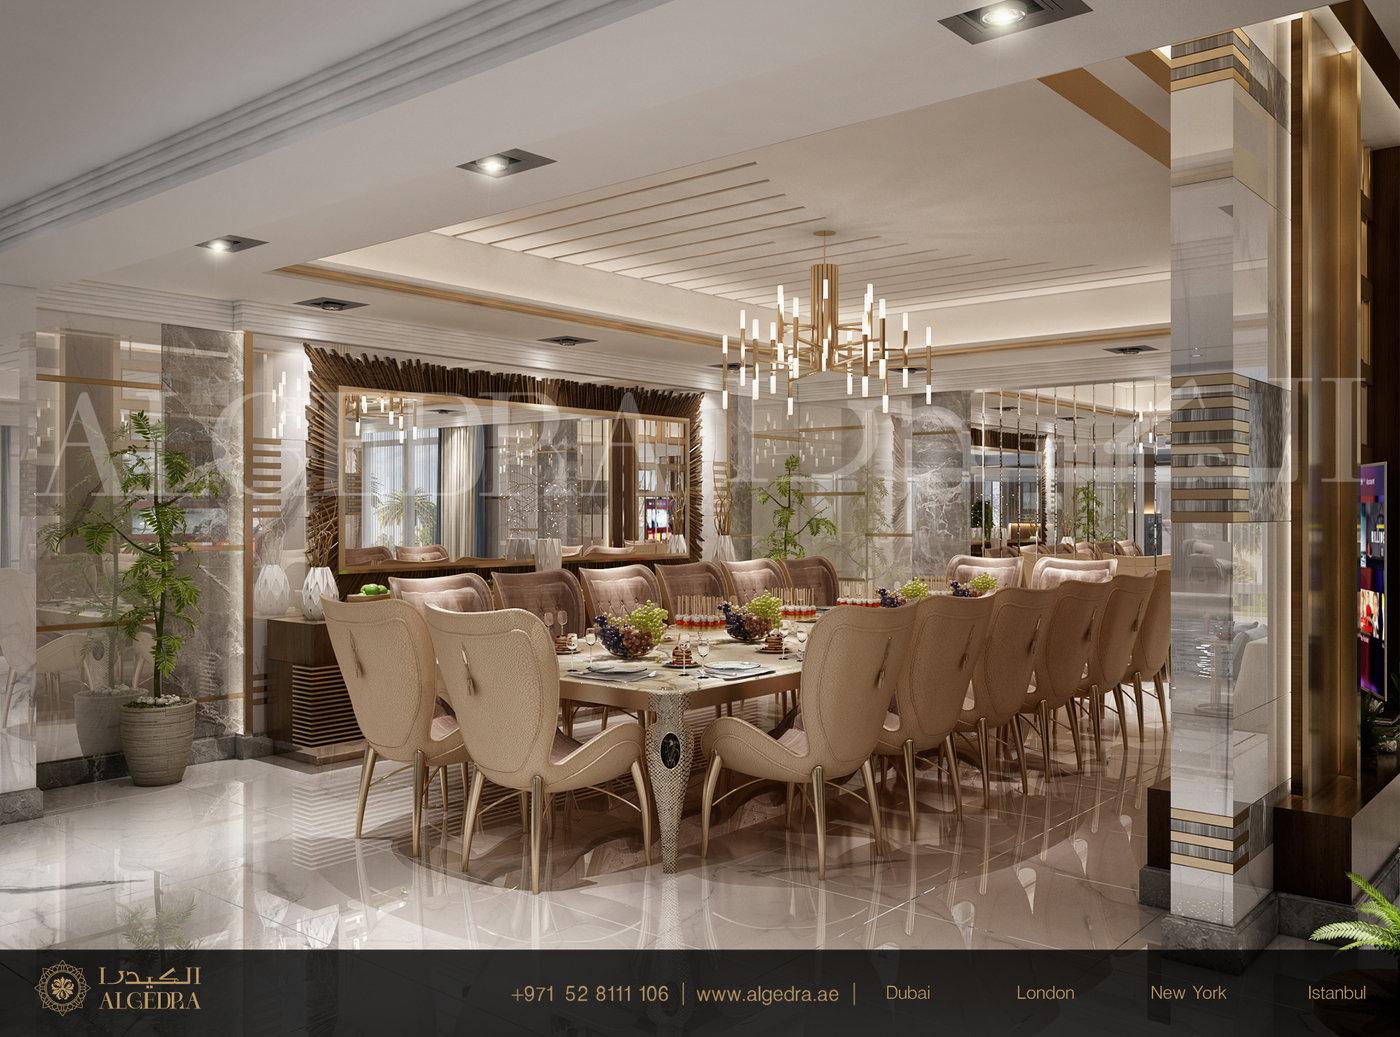 Luxurious Dining Room Design By Algedra Interior Design At Coroflot Com